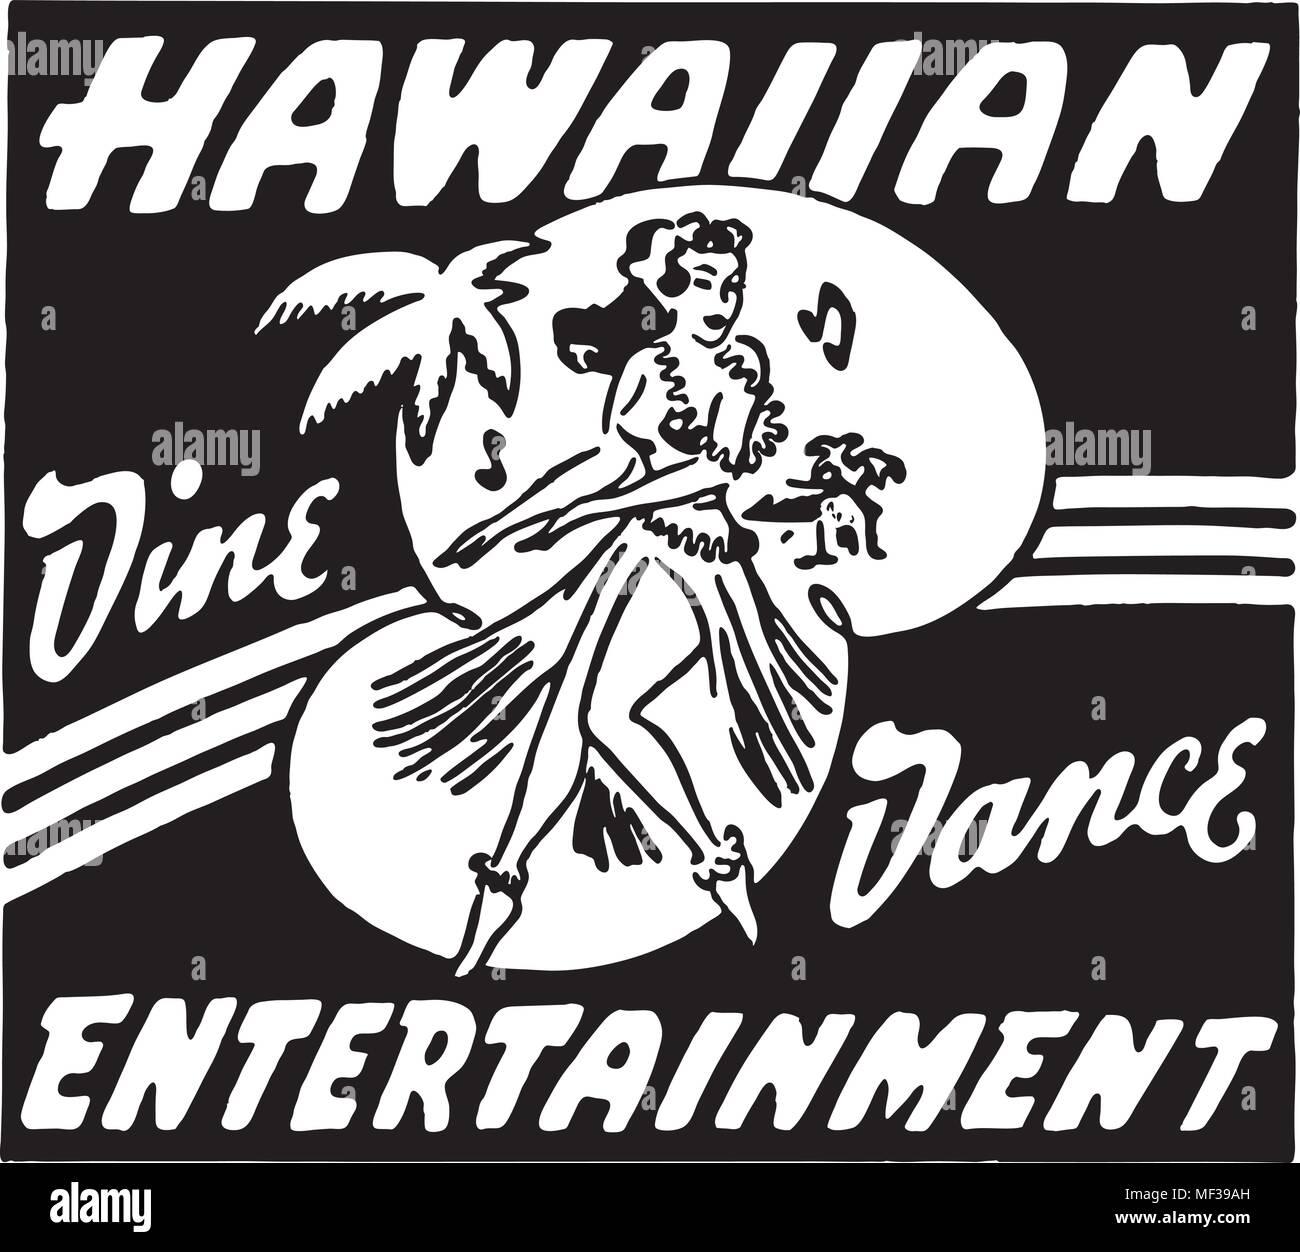 Hawaiian Entertainment - Retro Ad Art Banner - Stock Image